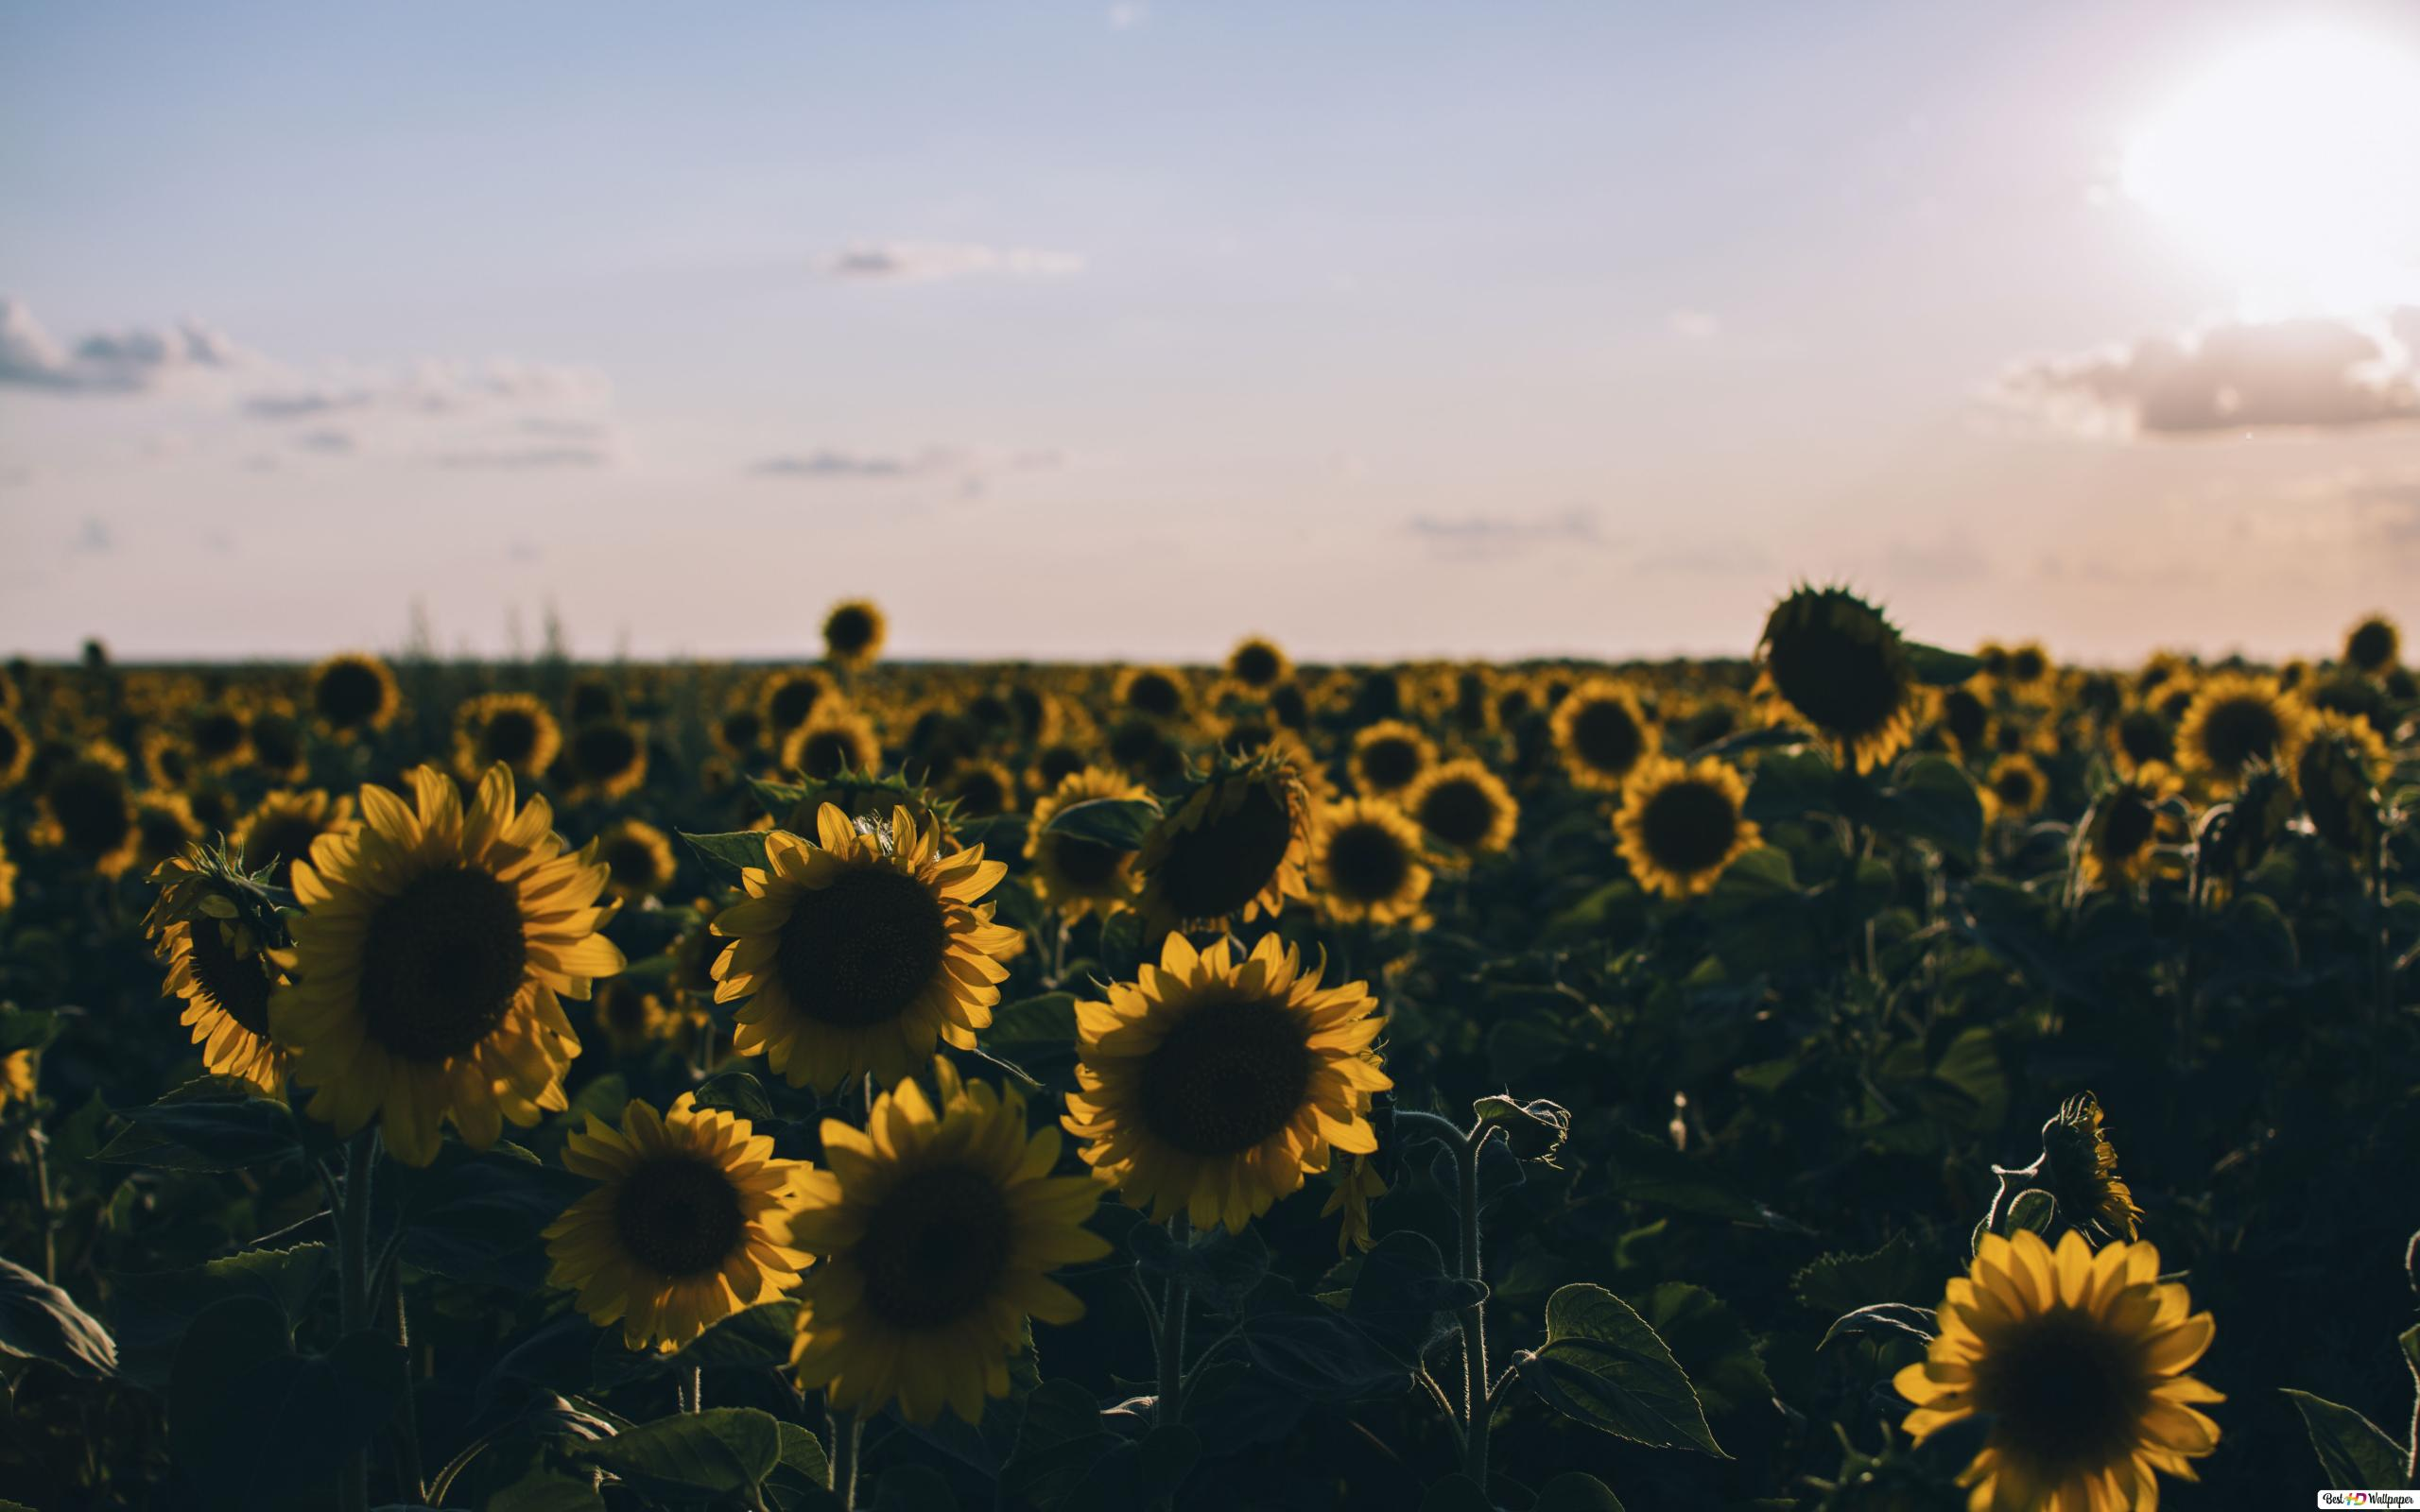 Sunflower Field Background Hd Wallpaper Download